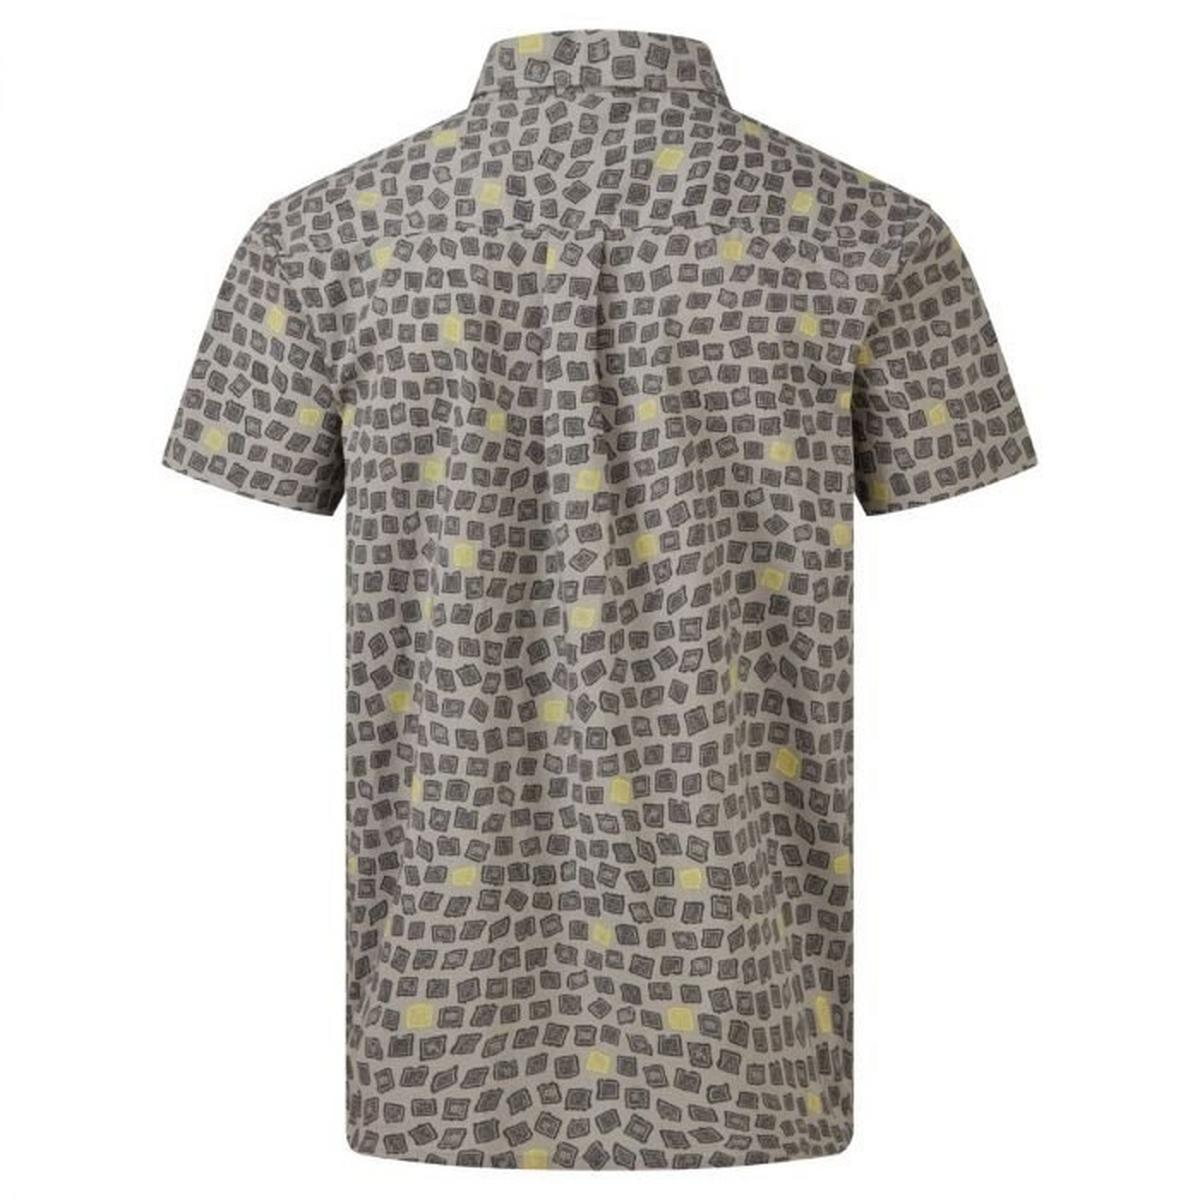 Sherpa Adventure Men's Doori Print SS Shirt - Grey